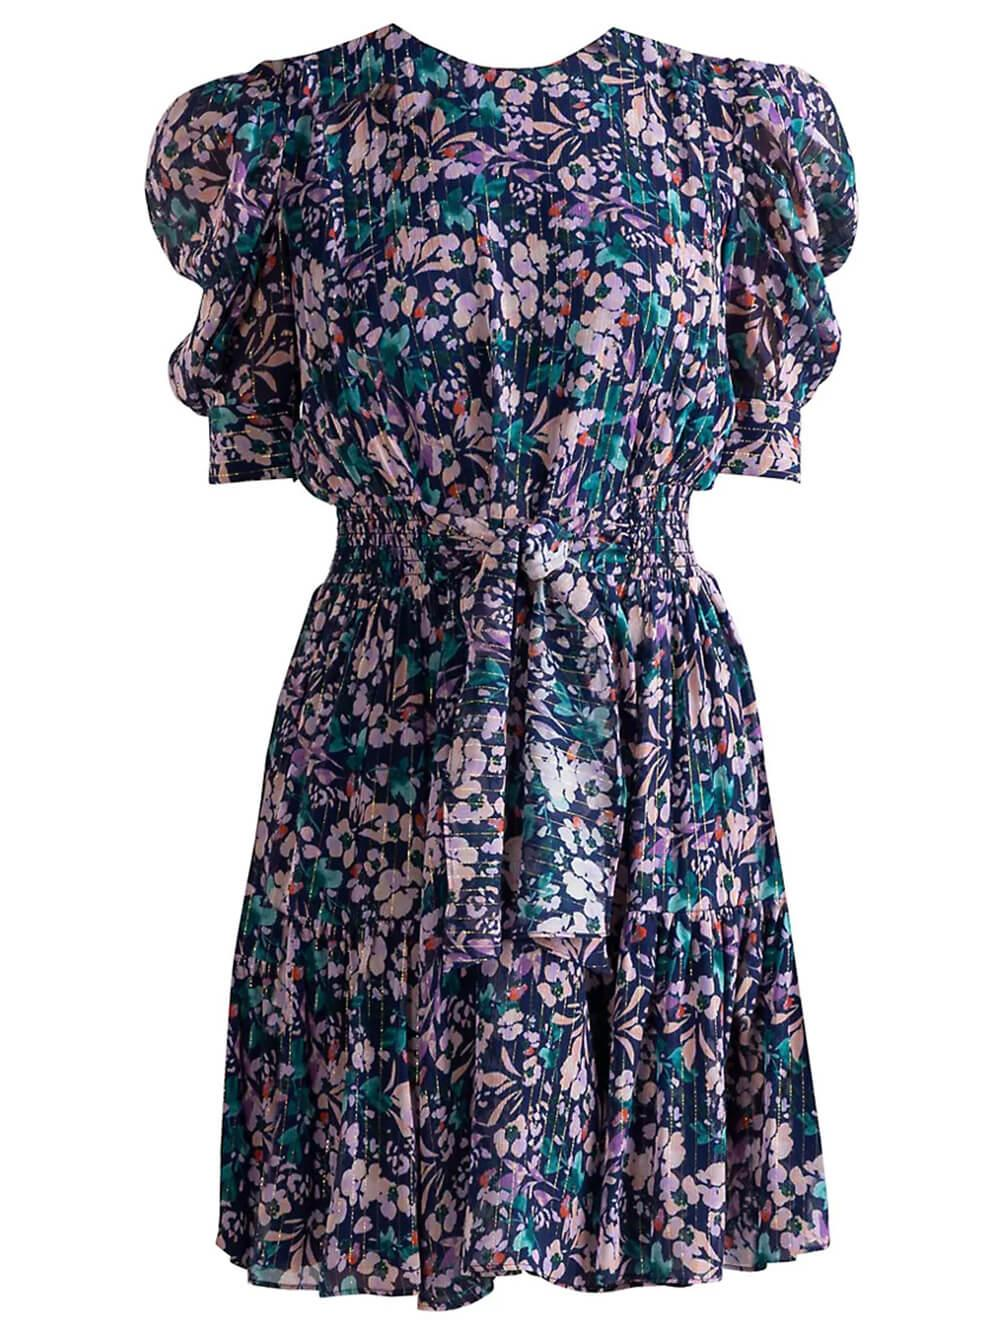 Greenwich Floral Carey Dress Item # 6159161